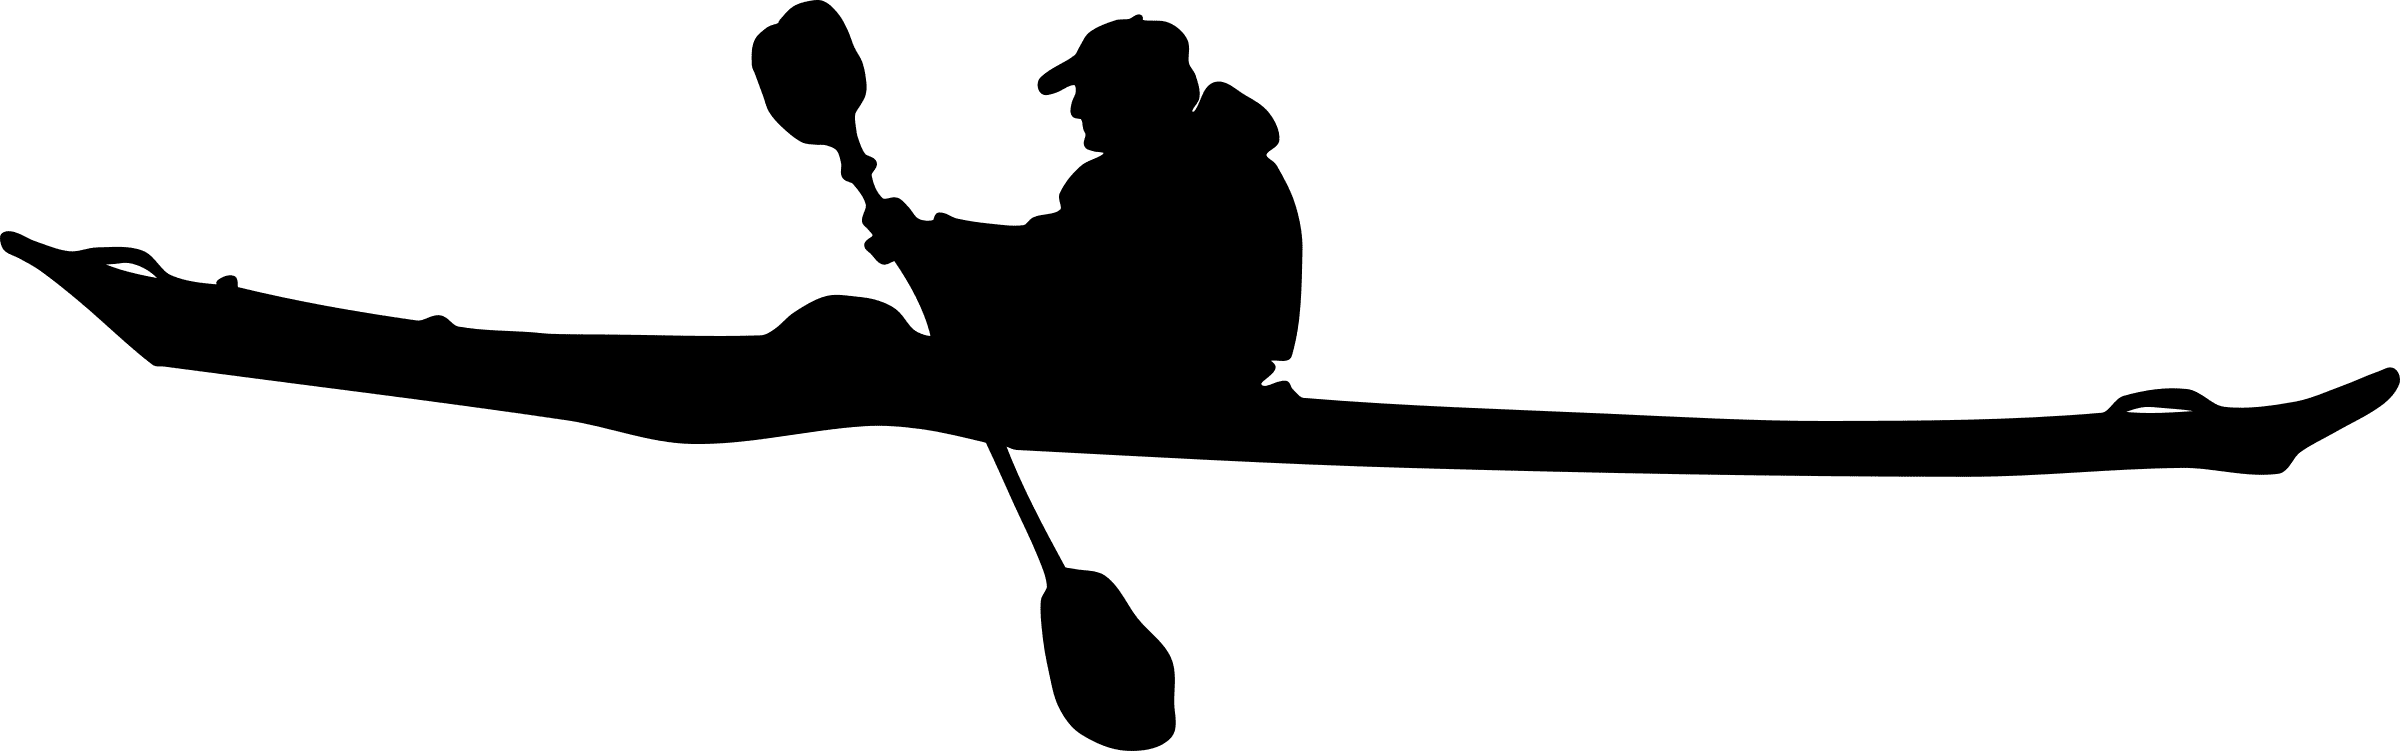 Download Man Fishing Boat Silhouette at GetDrawings   Free download